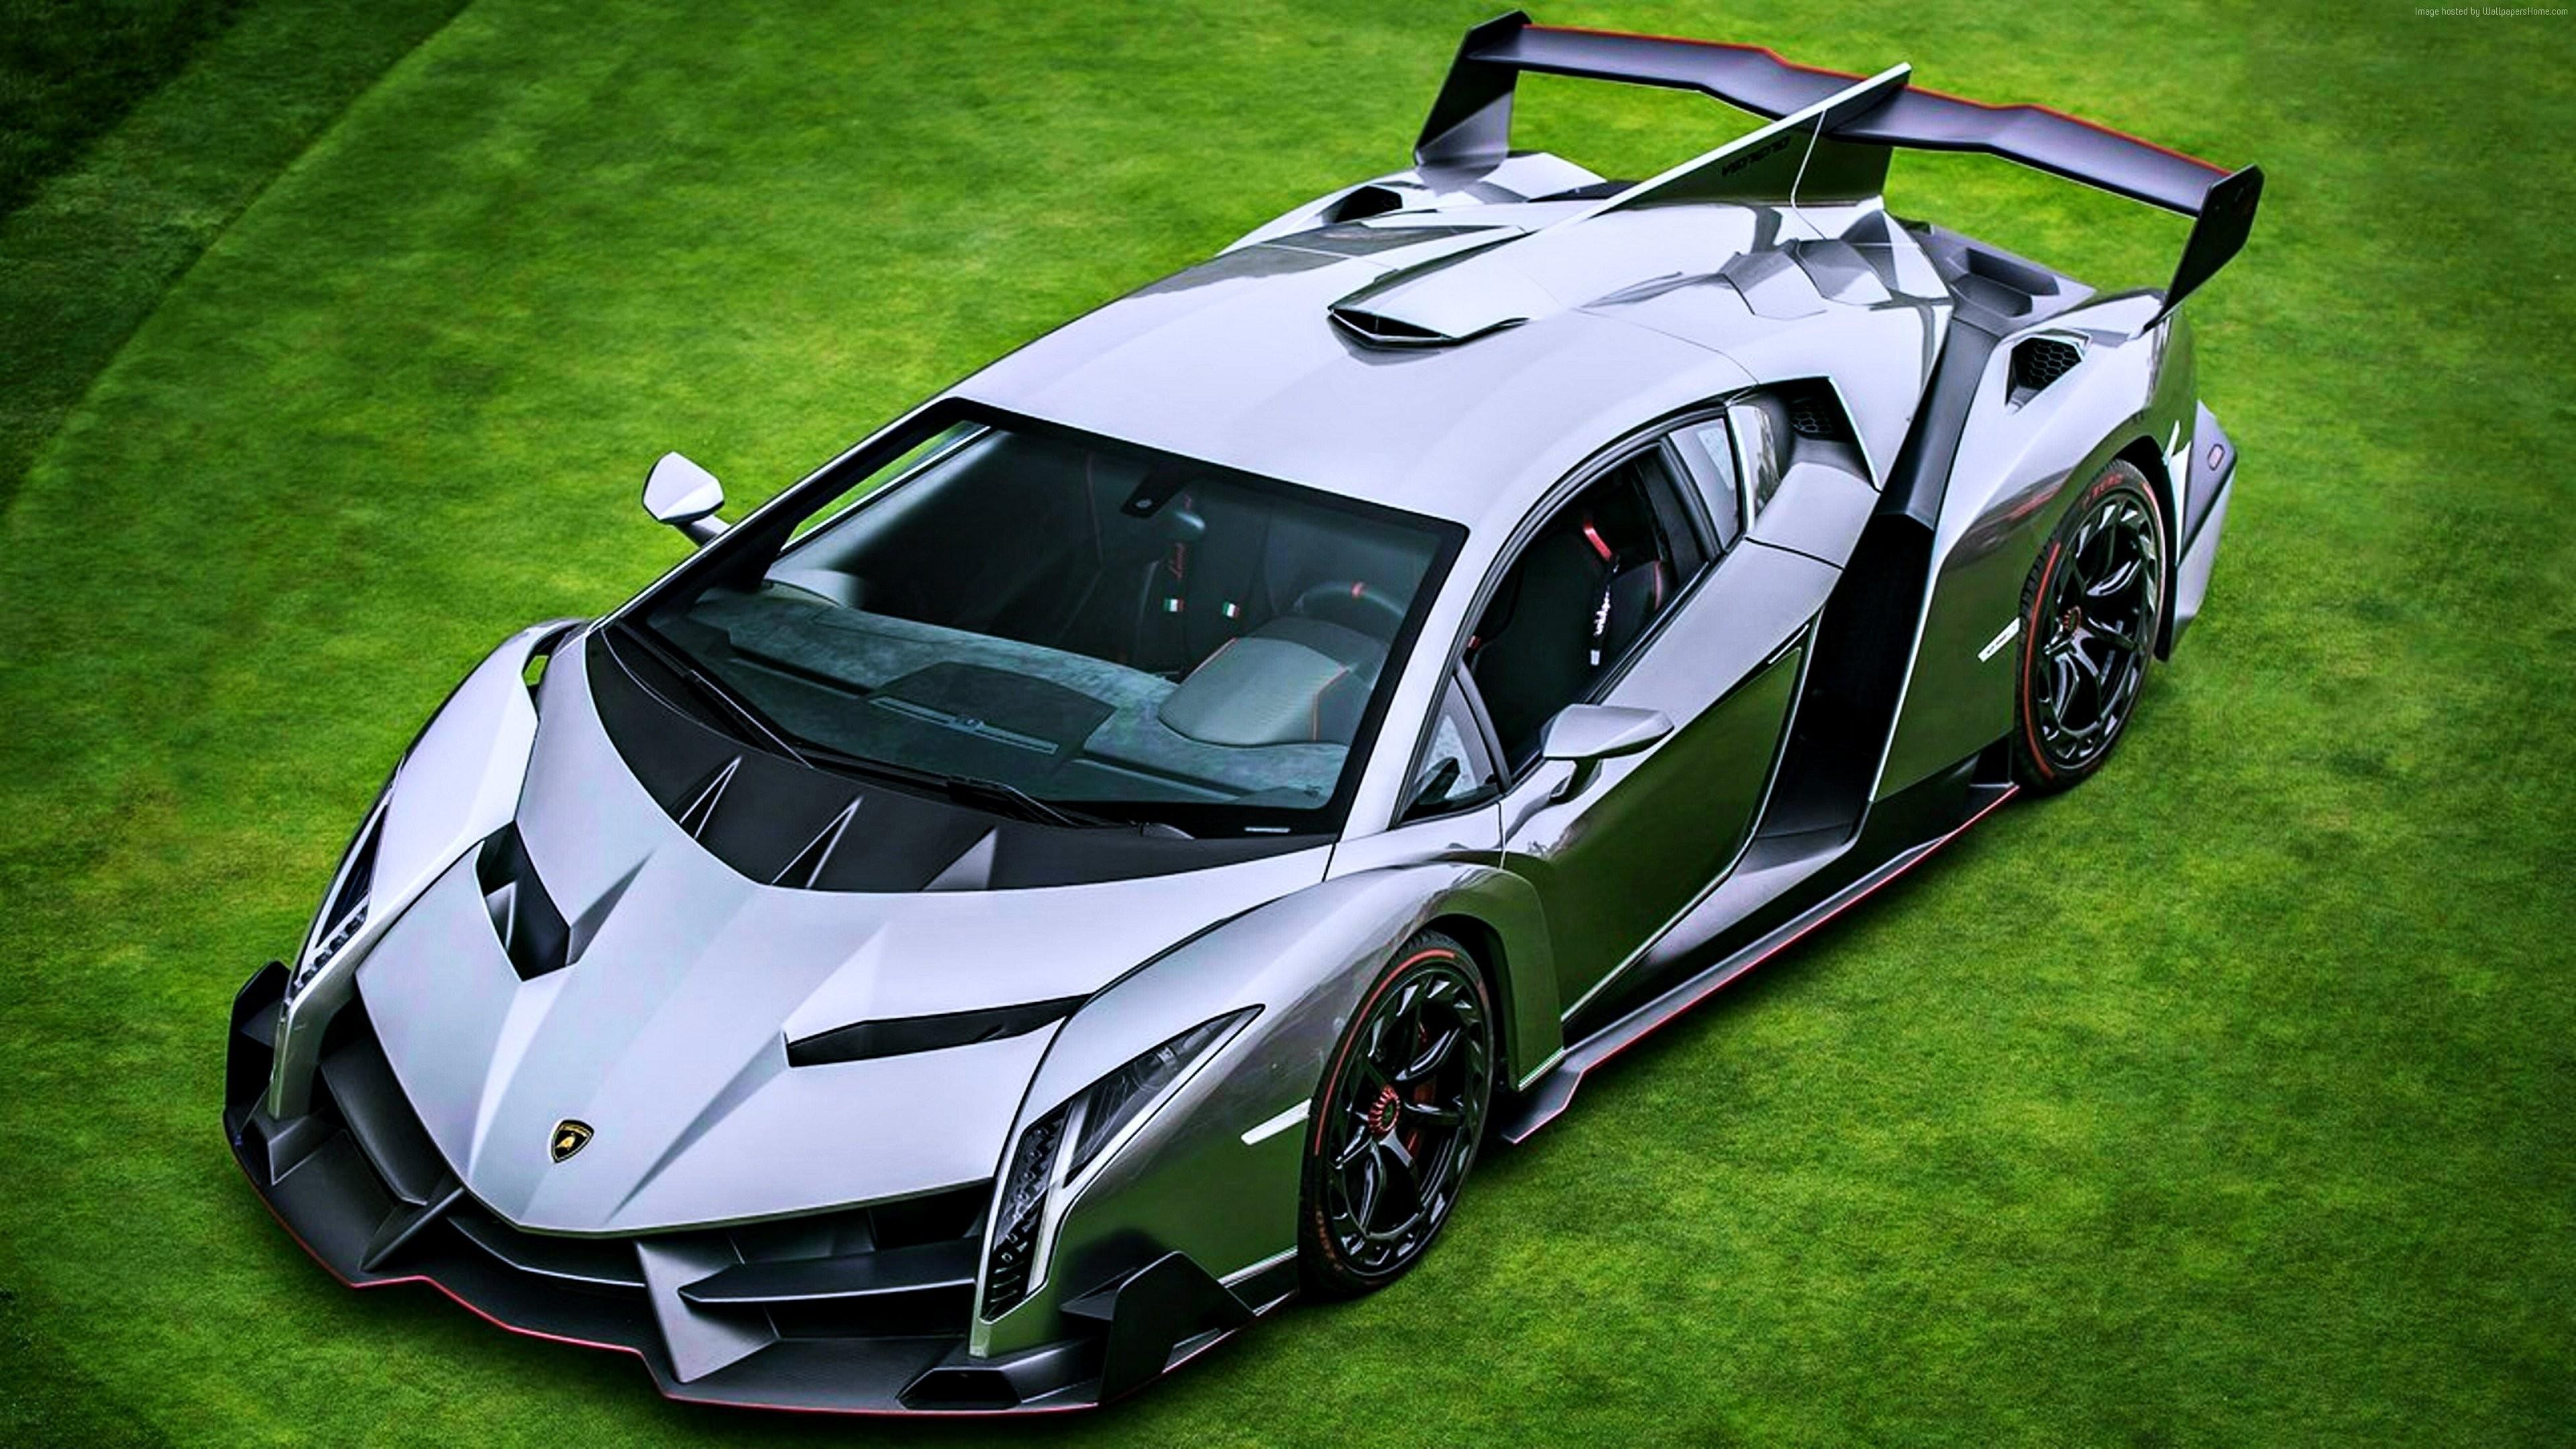 Lamborghini Veneno, supercar, Concept car (horizontal) …